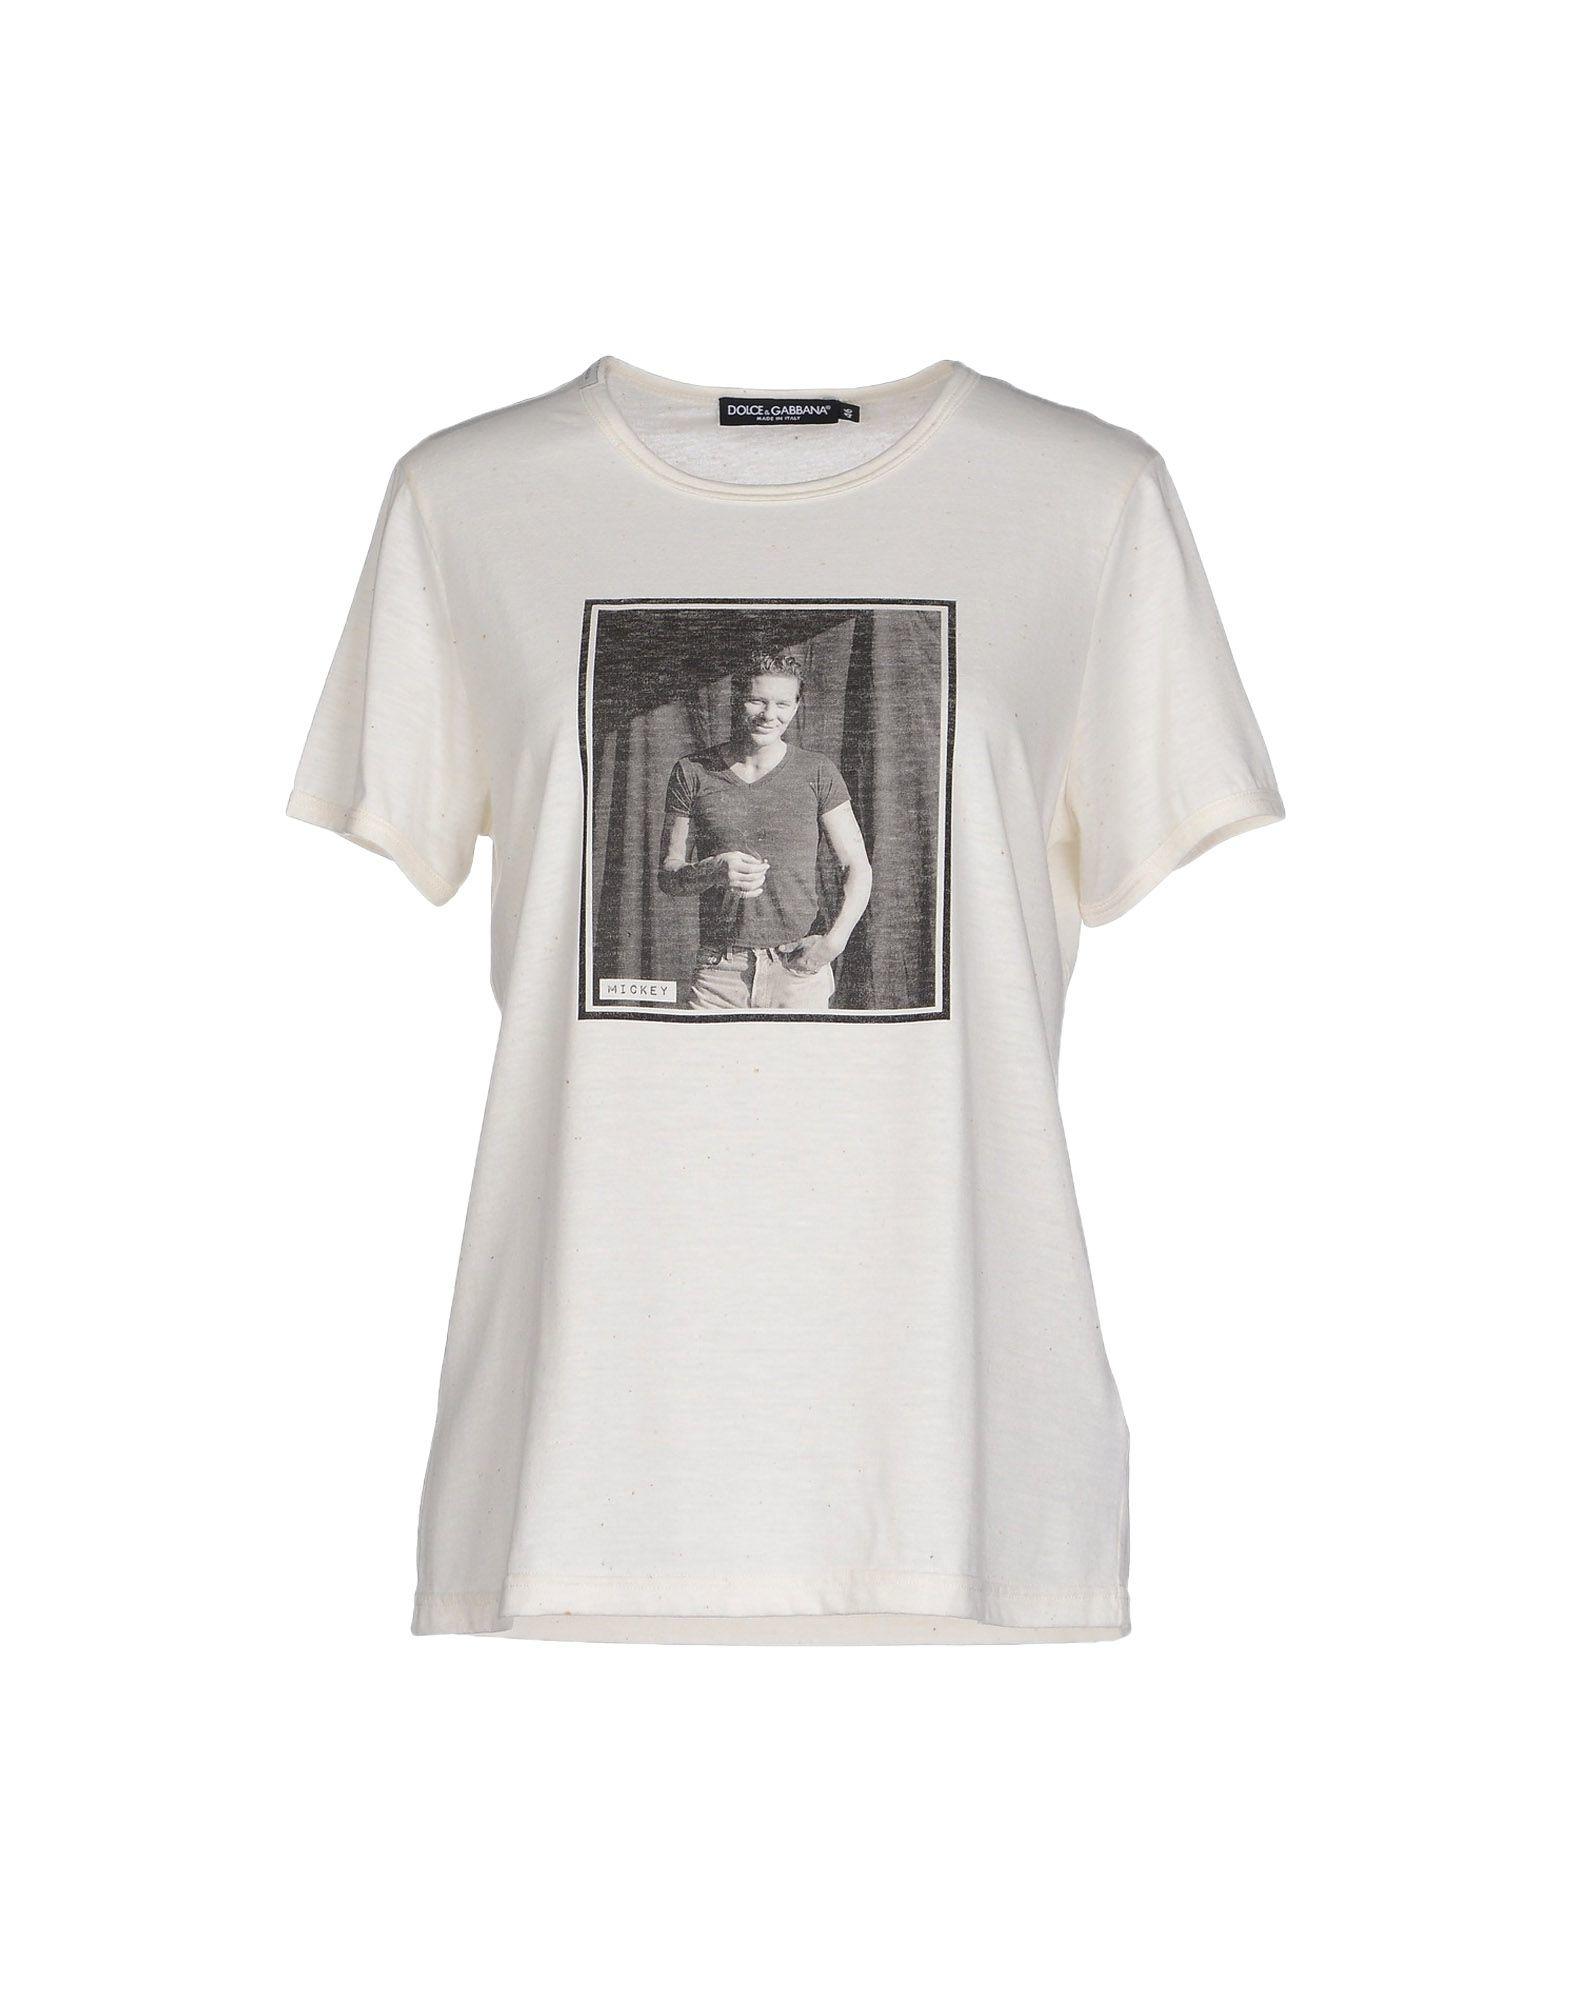 17d5151eae1d Dolce   gabbana T-shirt in White